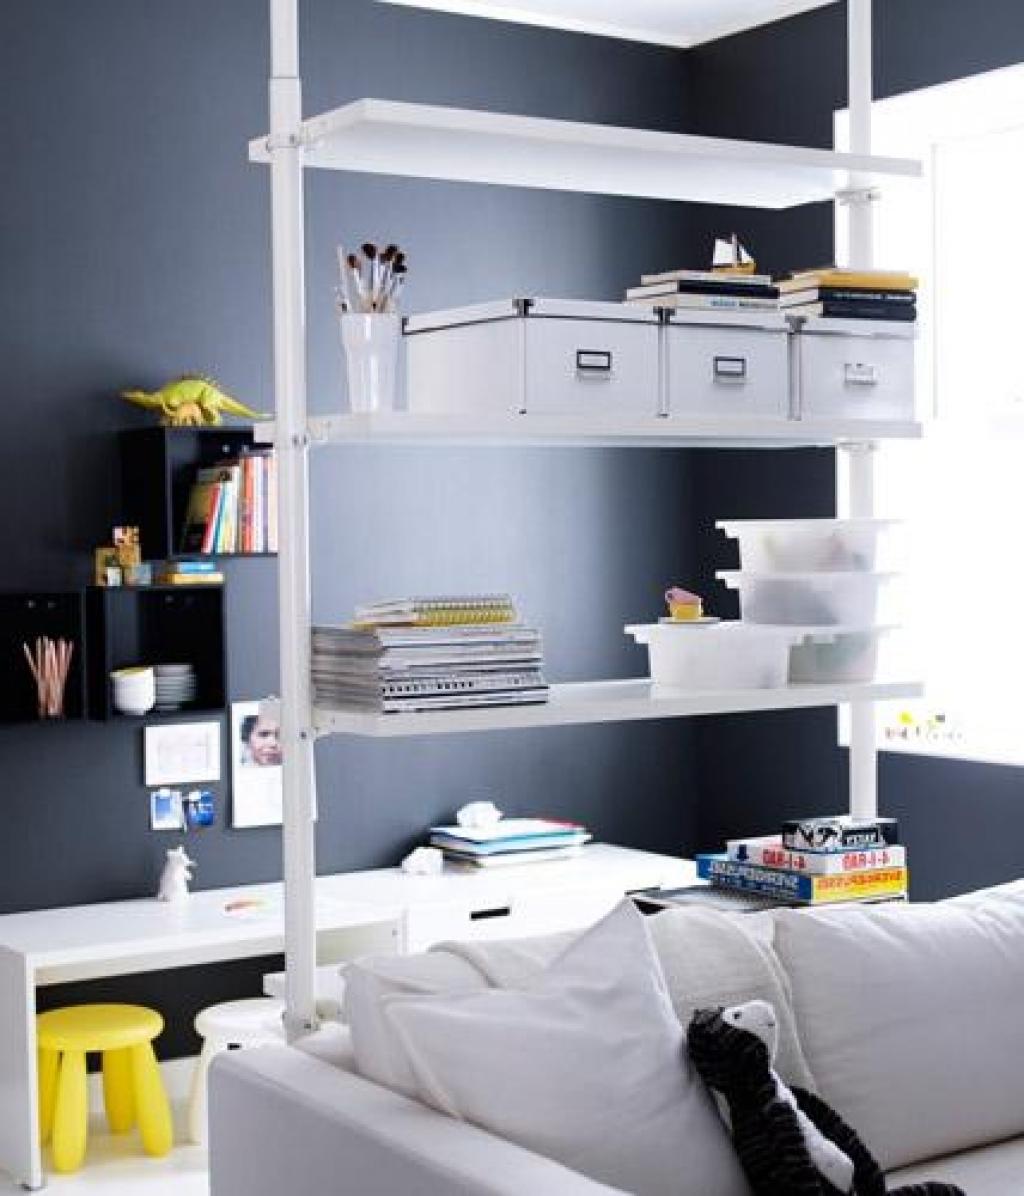 Full Size of Raumteiler Ikea Bucherregal Ideen Küche Kaufen Betten Bei Regal Sofa Mit Schlaffunktion Modulküche Miniküche Kosten 160x200 Wohnzimmer Raumteiler Ikea